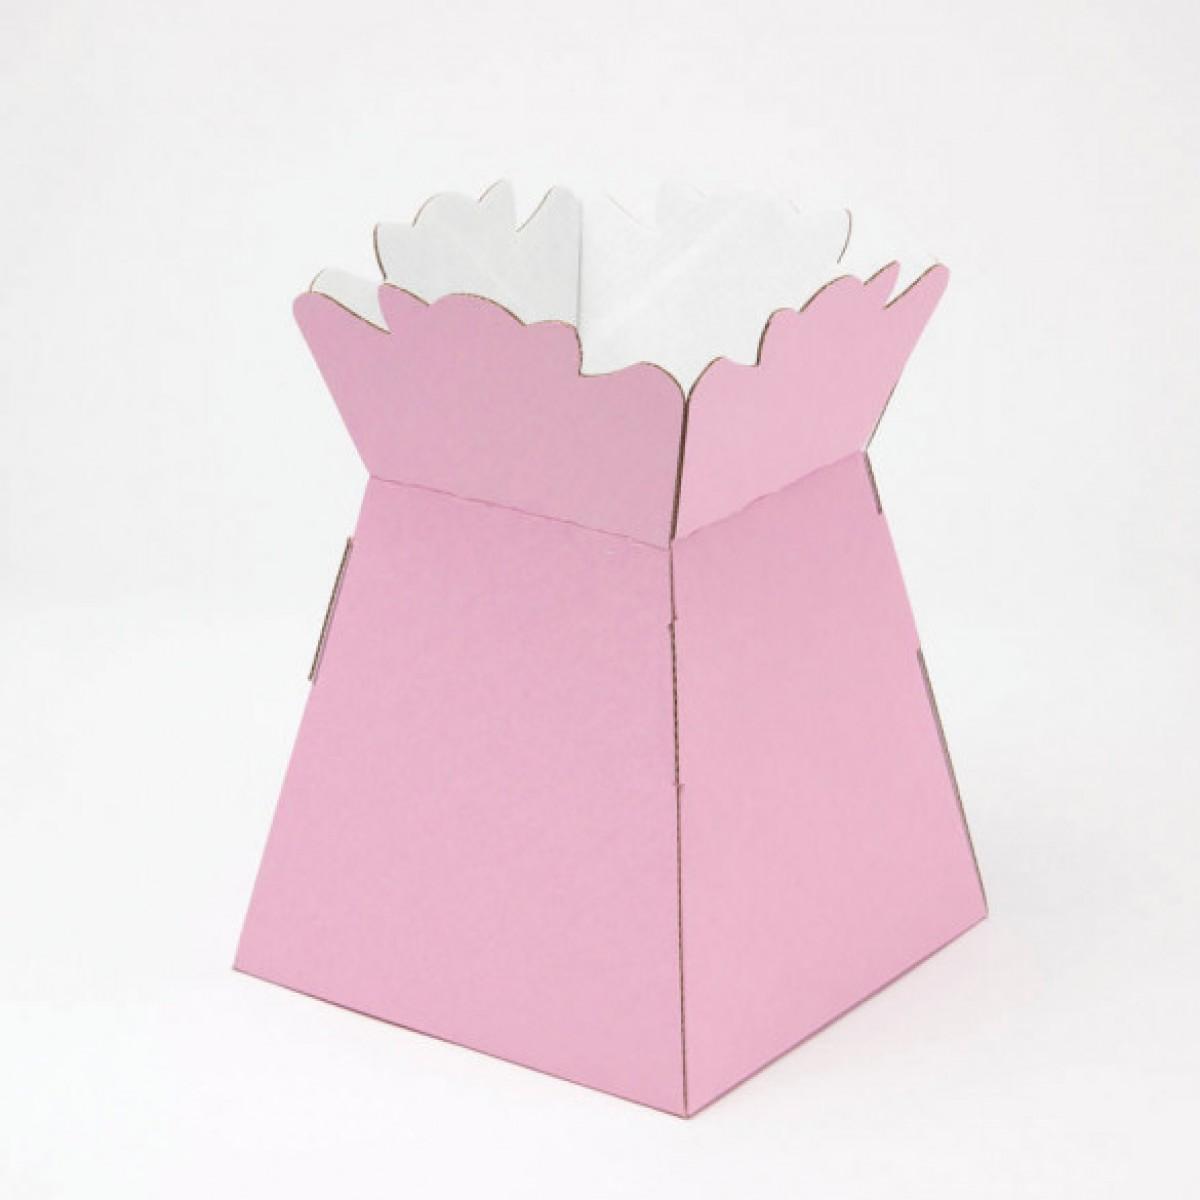 Porto Vase Pink 17x24cm - Pack Of 5